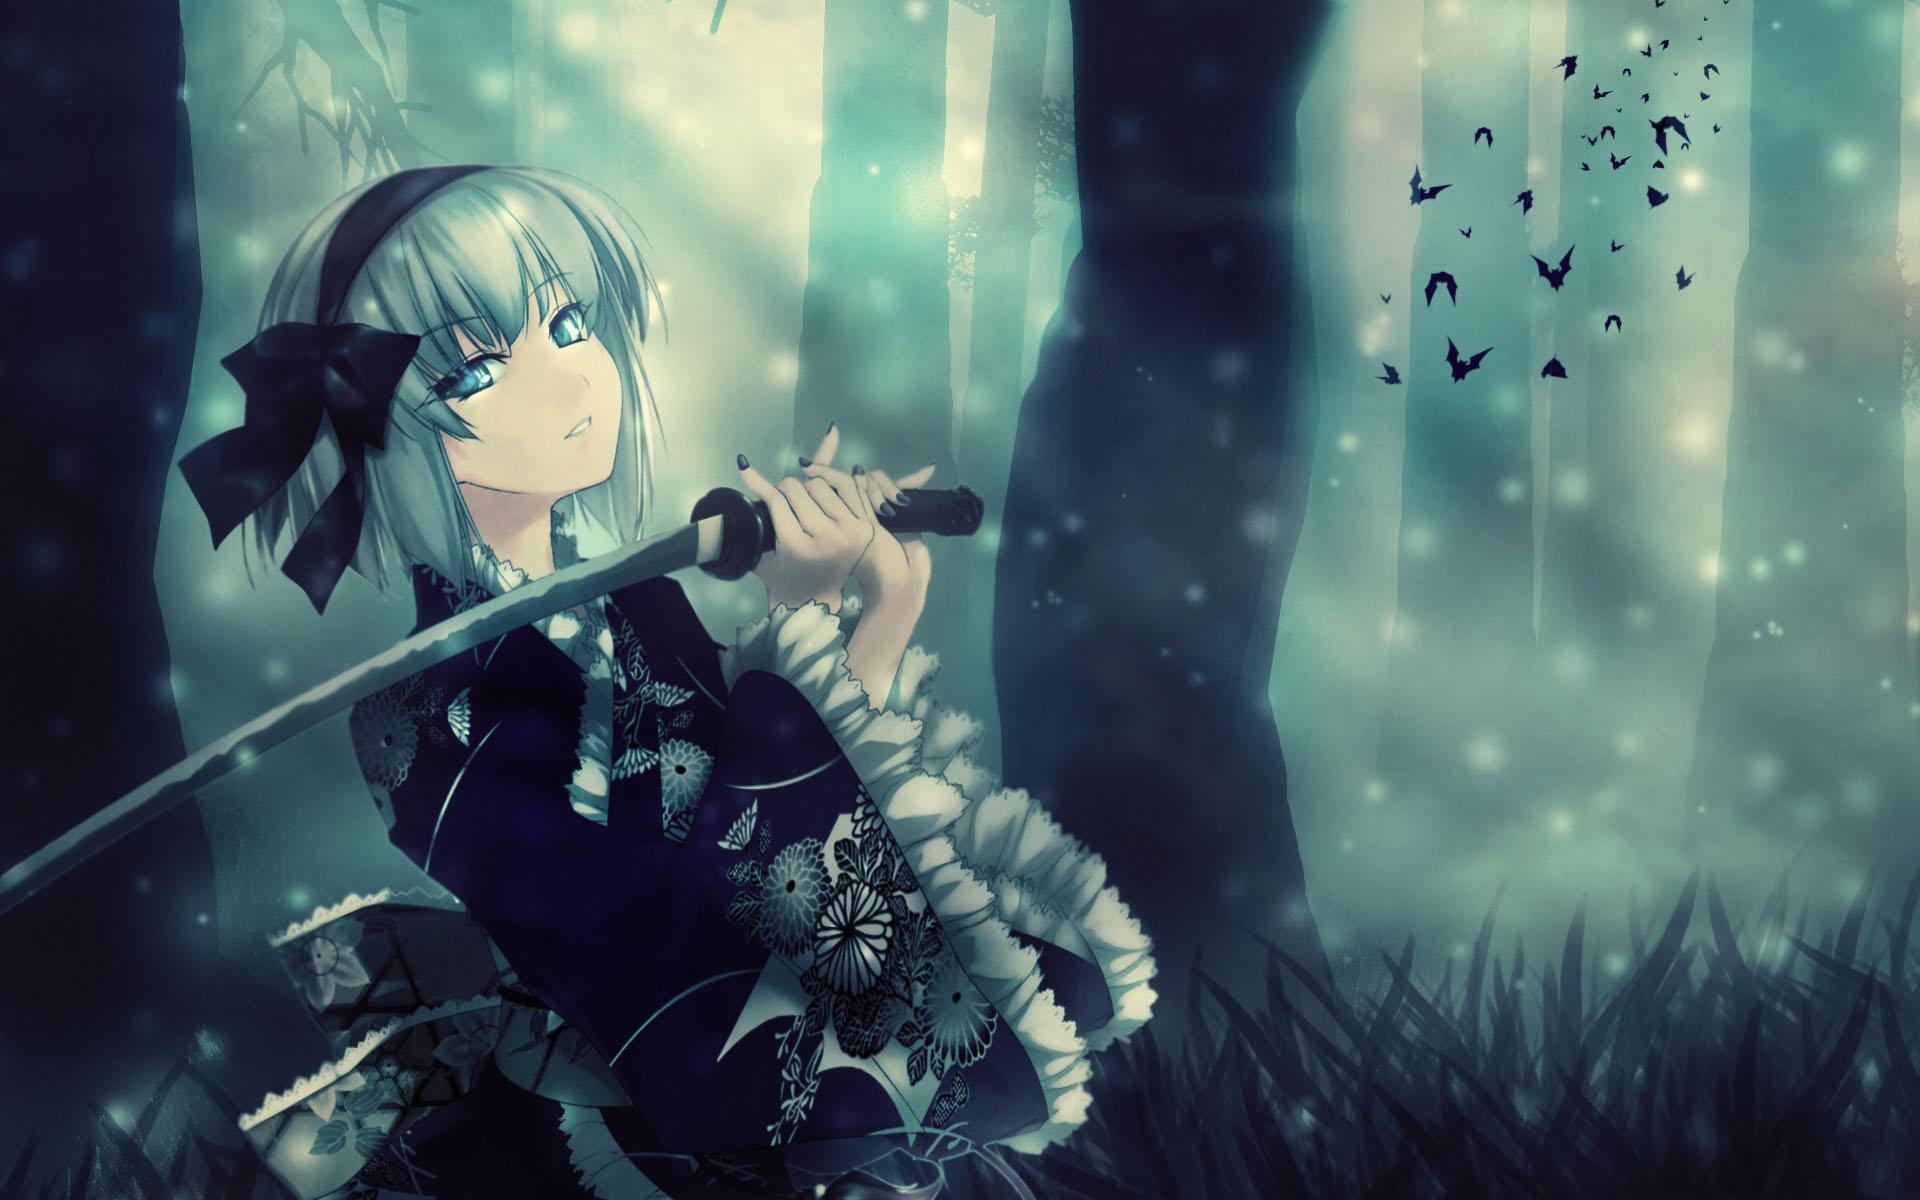 Hd Anime Girl Wallpaper 1920x1200